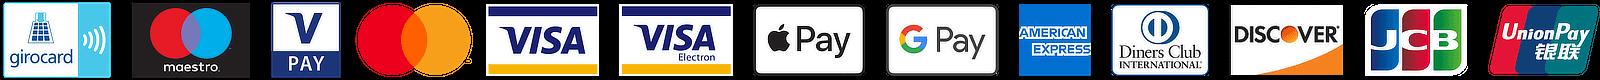 Logos aller akzeptierten Kreditkarten